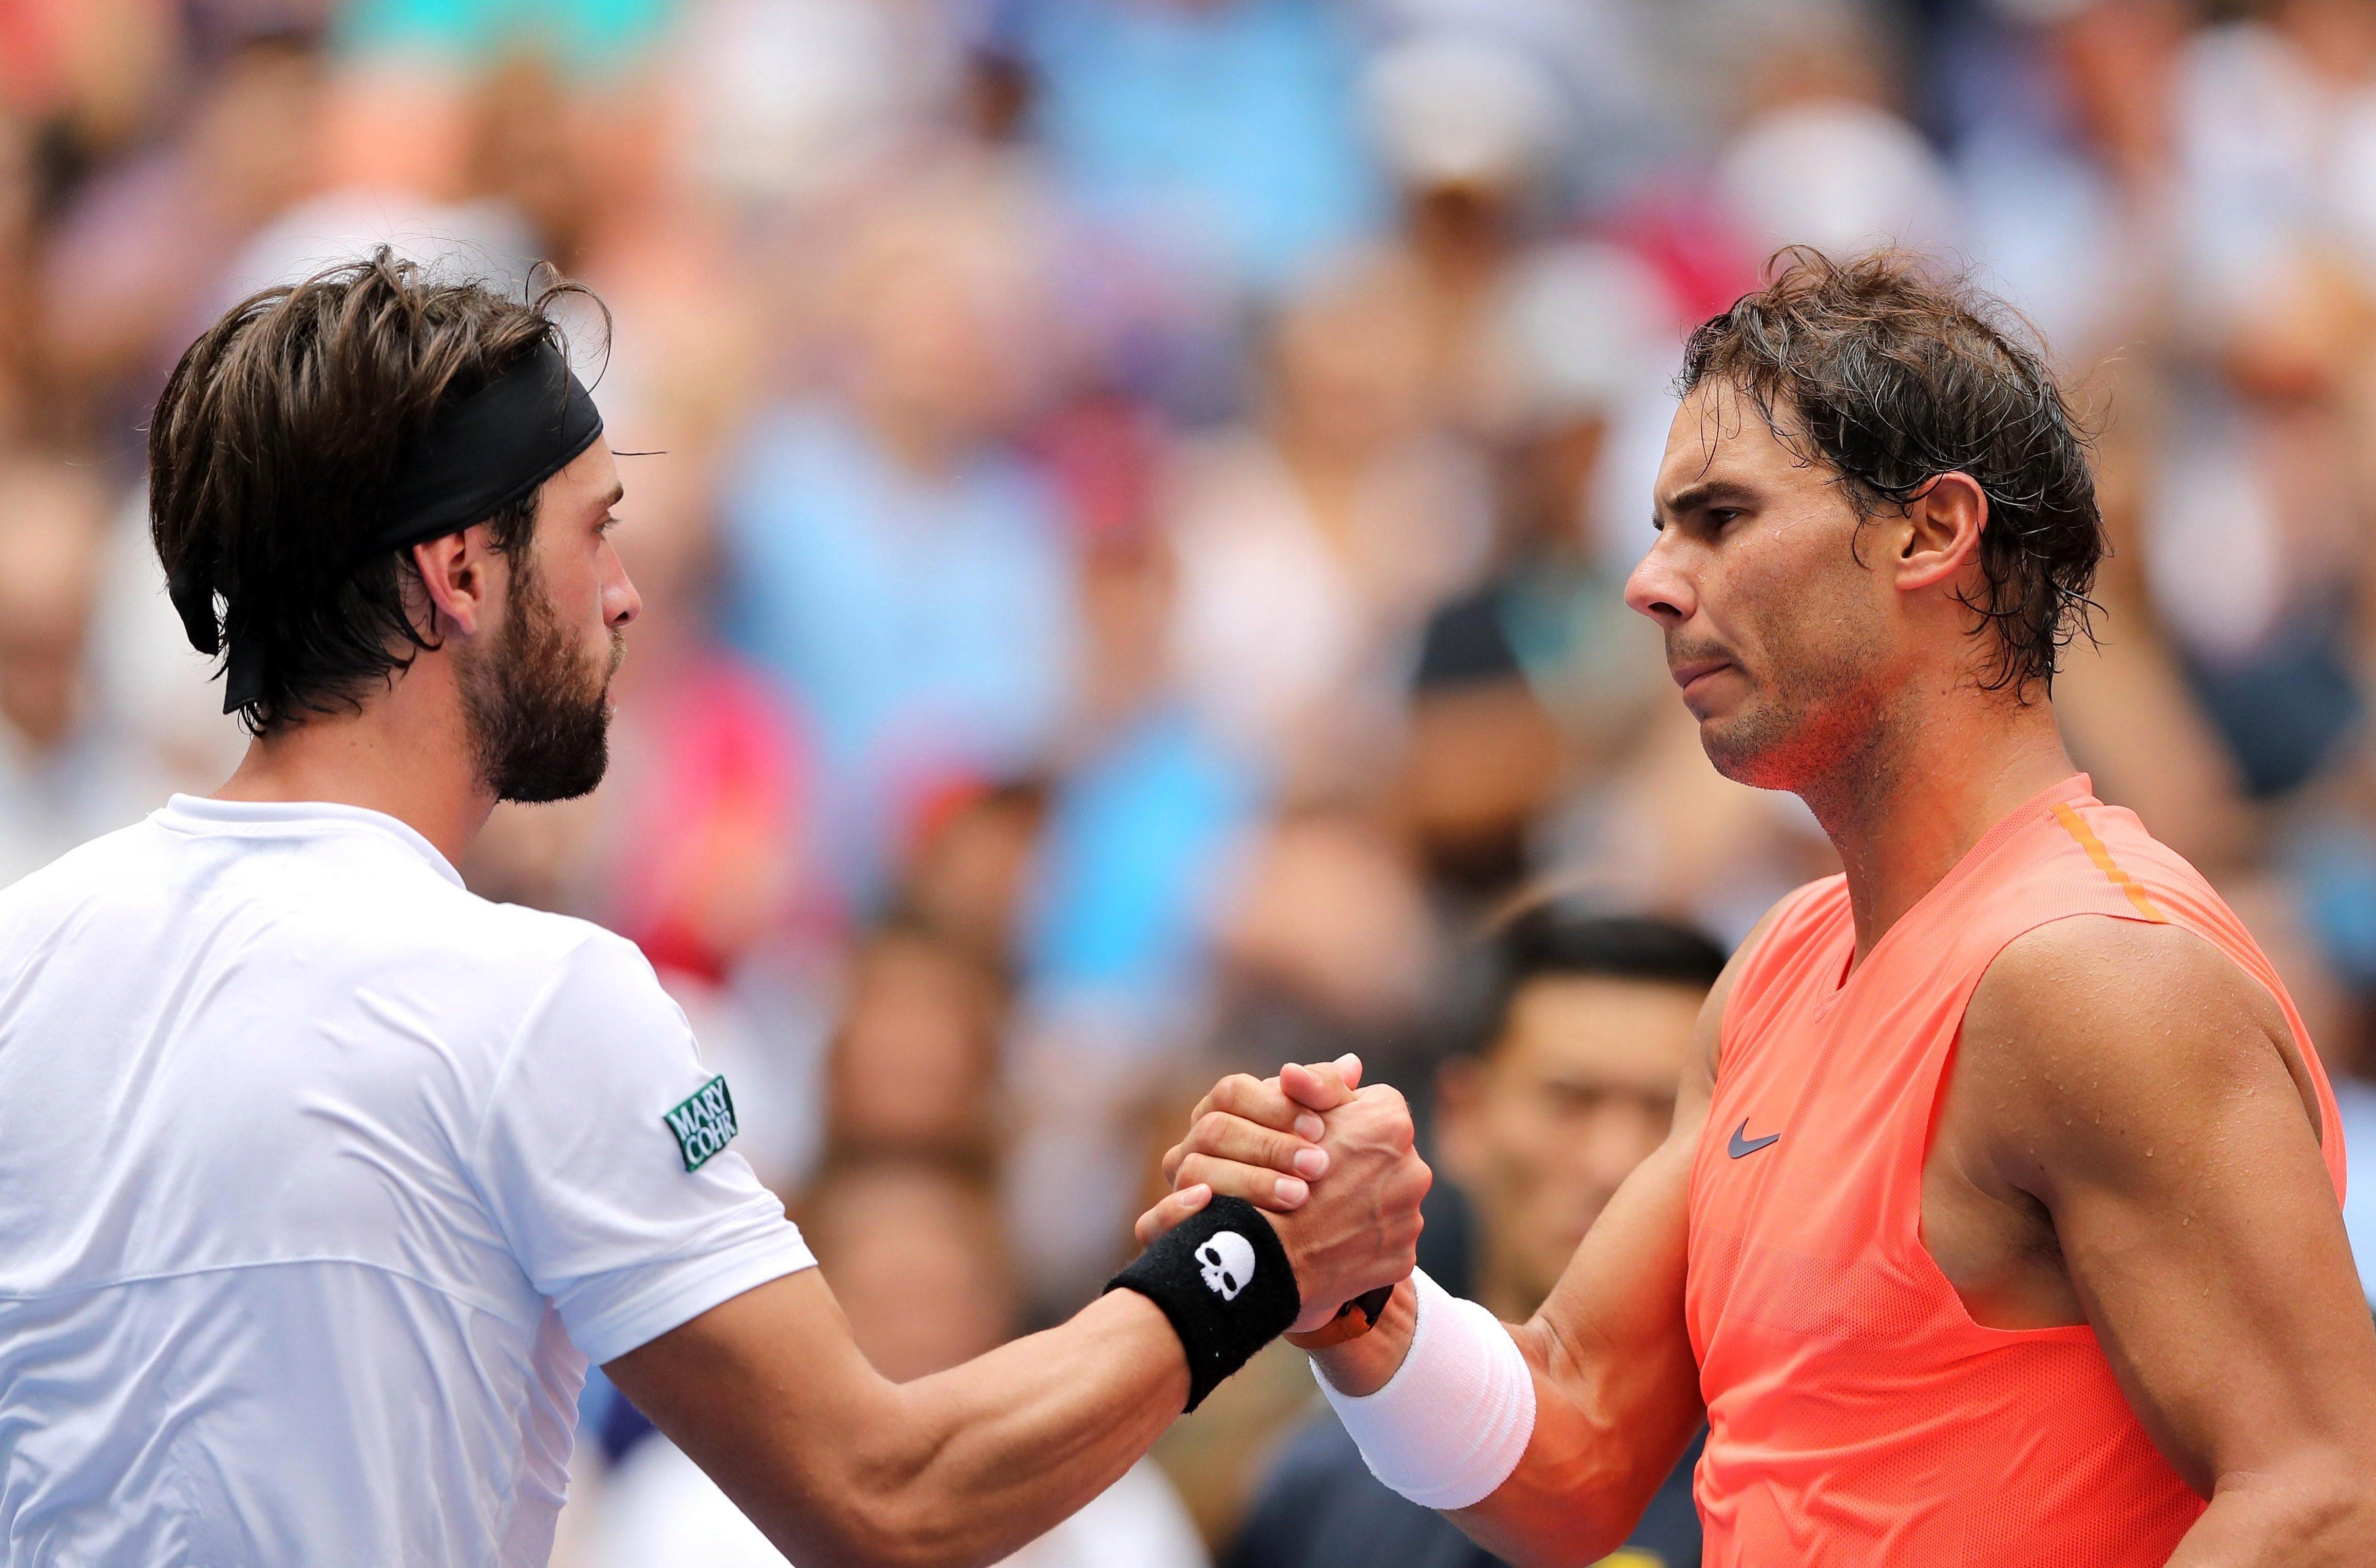 Rafael Nadal beat Nikoloz Basilashvili 6-3 6-3 6-7 6-4 in the fourth round